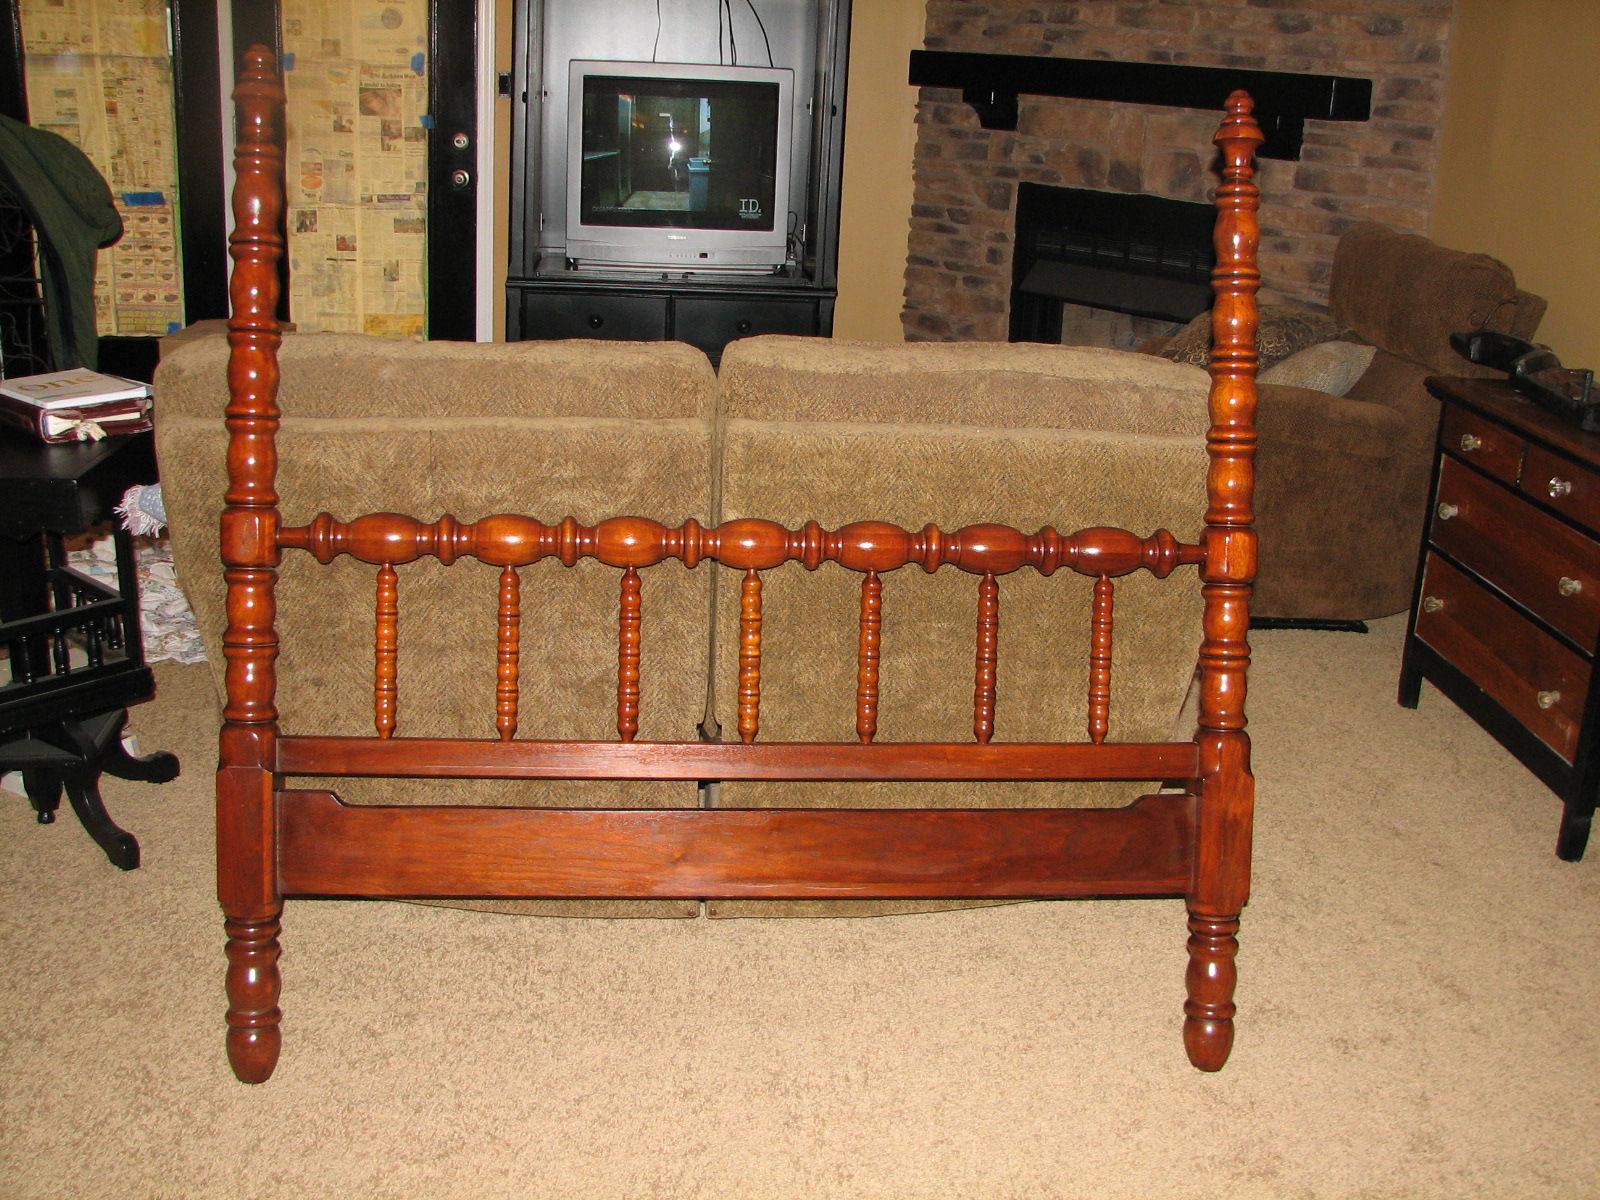 Lillian Russell Bedroom Furniture : Lillian Russell Black Walnut Bedroom set For Sale  Antiques.com ...